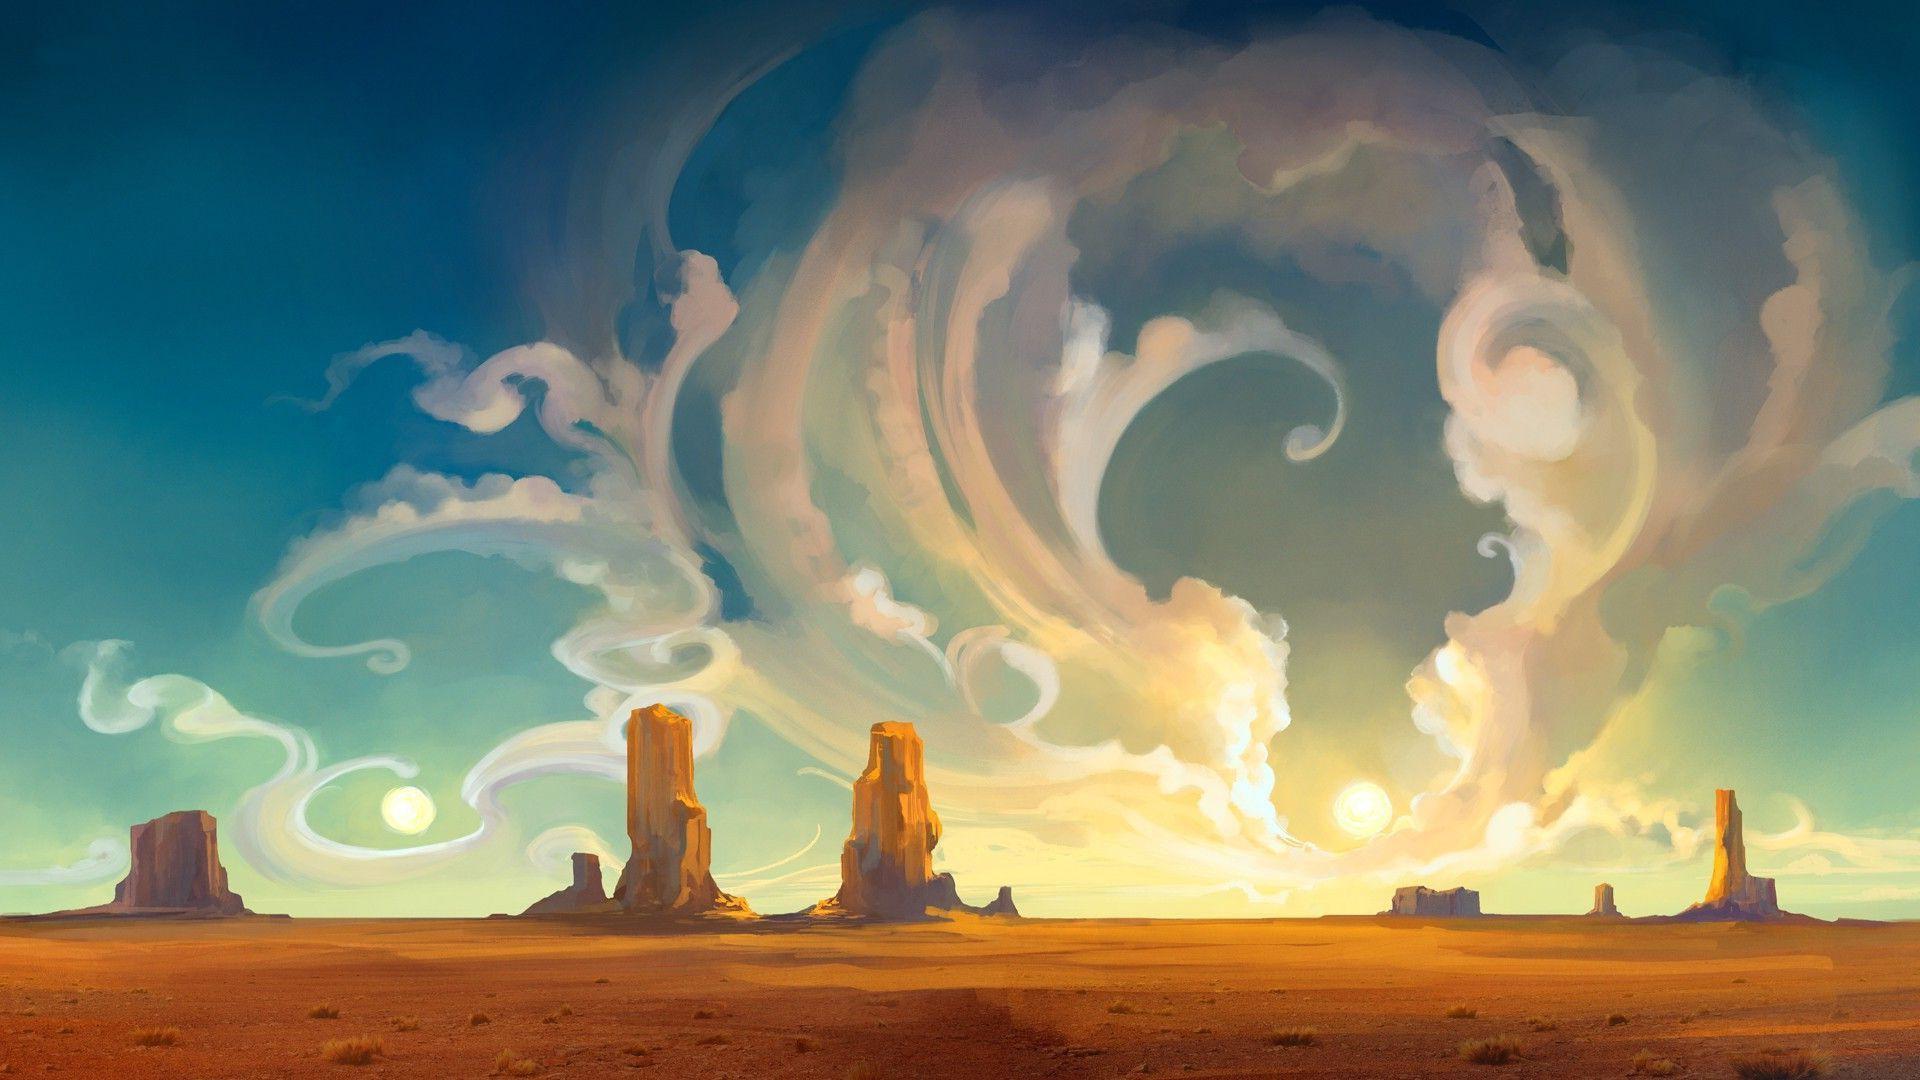 concept art wallpaper,sky,cloud,natural environment,geological phenomenon,atmosphere